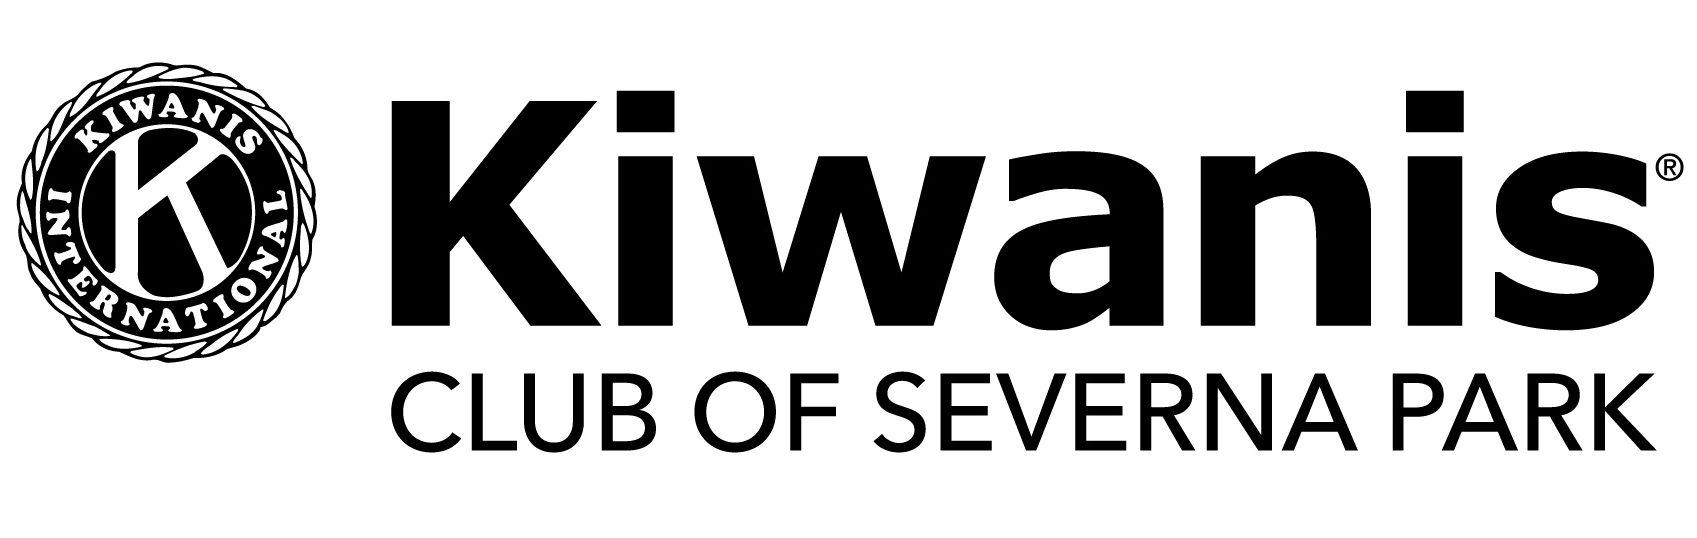 Kiwanis Club of Severna Park